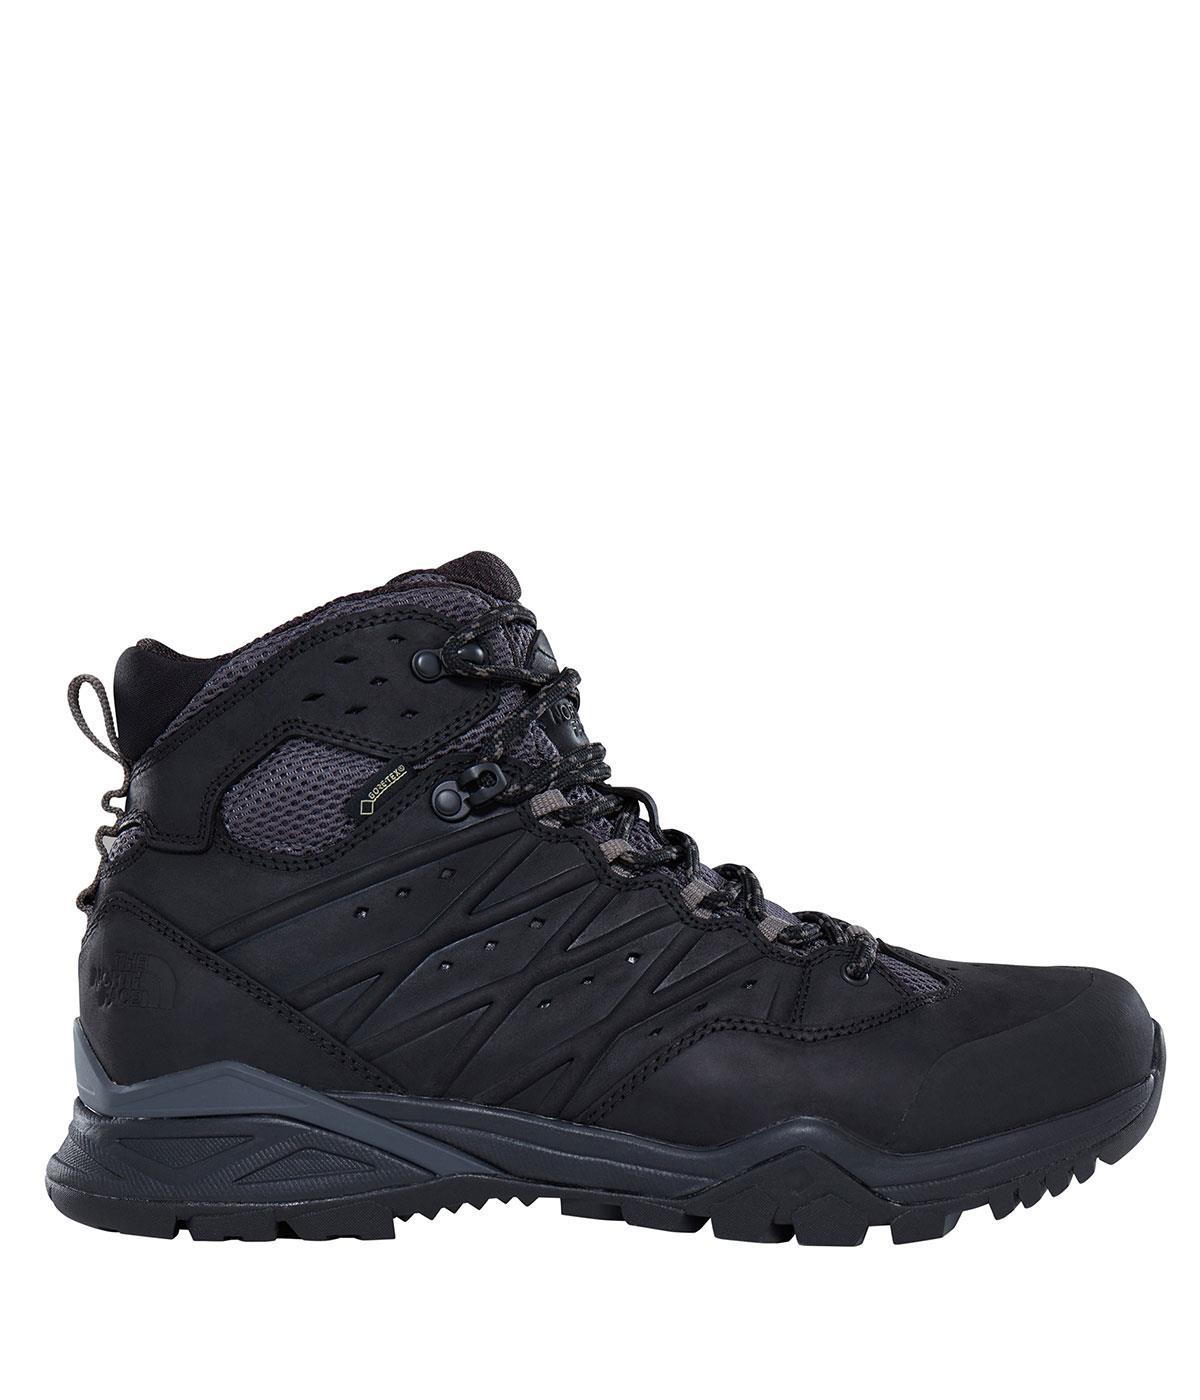 The North Face Erkek  Hh Hike İi Md Gtx Nf0A2Yb4Ku61 Ayakkabı